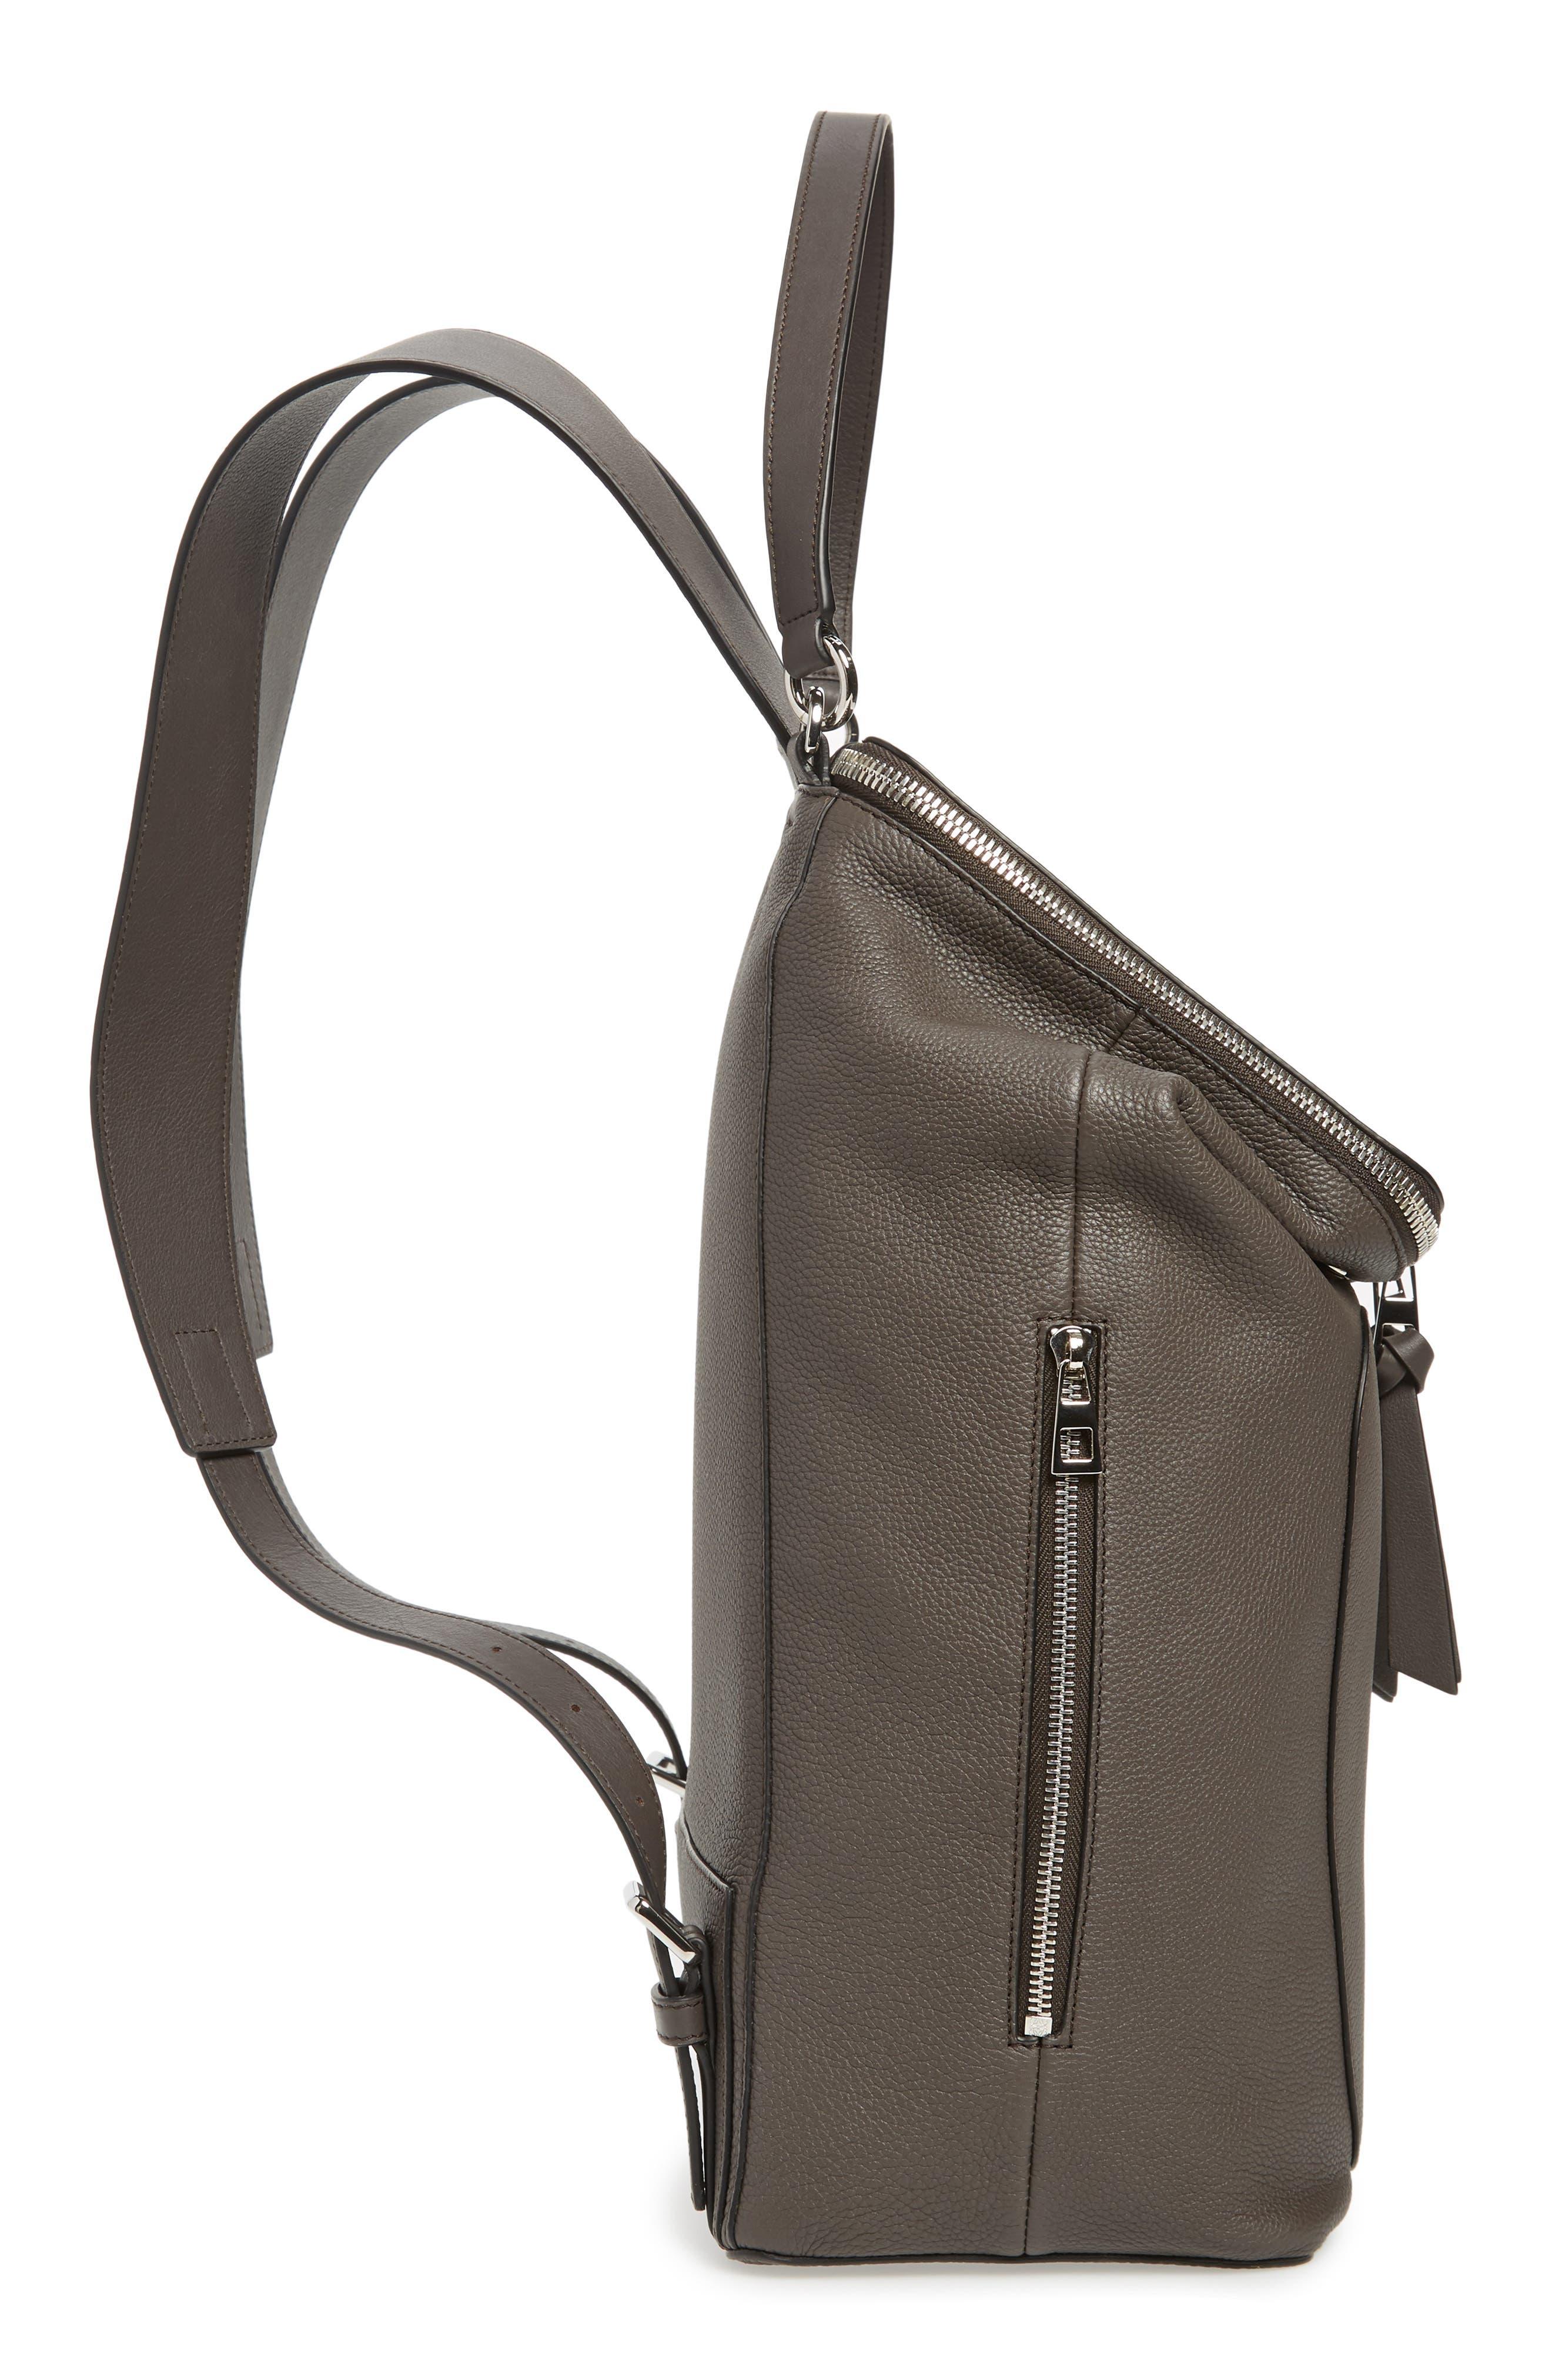 Goya Plaid Calfskin Leather Backpack,                             Alternate thumbnail 5, color,                             022